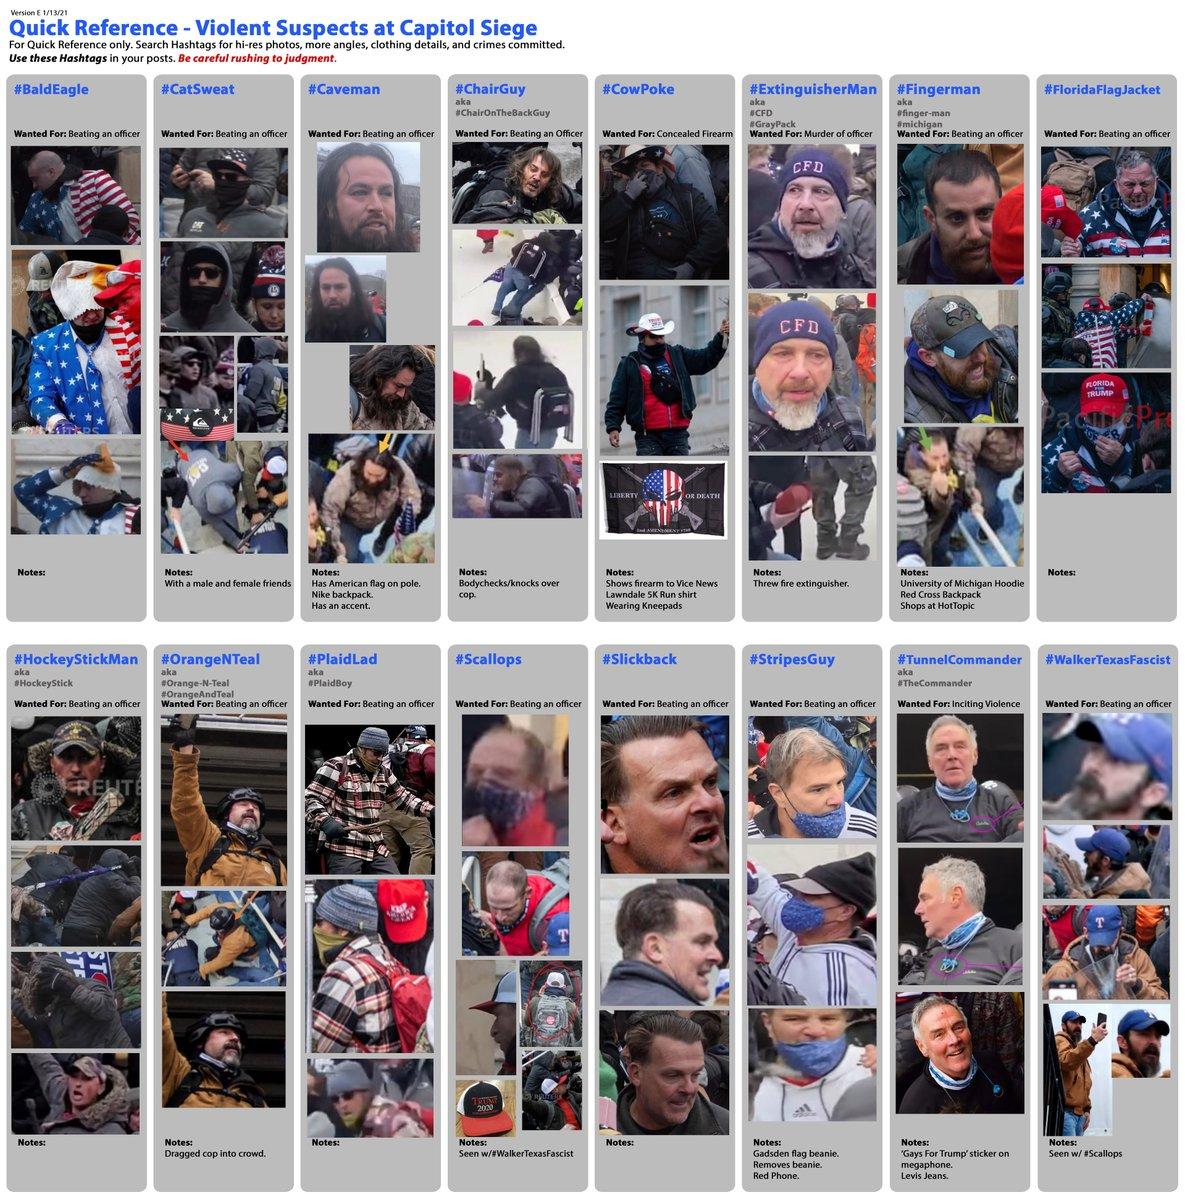 #SeditionHunters @no_nazis_please @beebthesimp Violent Suspects at The Capitol Siege Update E #BaldEagle #CatSweat #Caveman #ChairGuy #CowPoke #Extinguisherman #Fingerman #FloridaFlagJacket #HockeyStickMan #OrangeNTeal #PlaidLad #Scallops #Slickback #StripesGuy #TunnelCommander